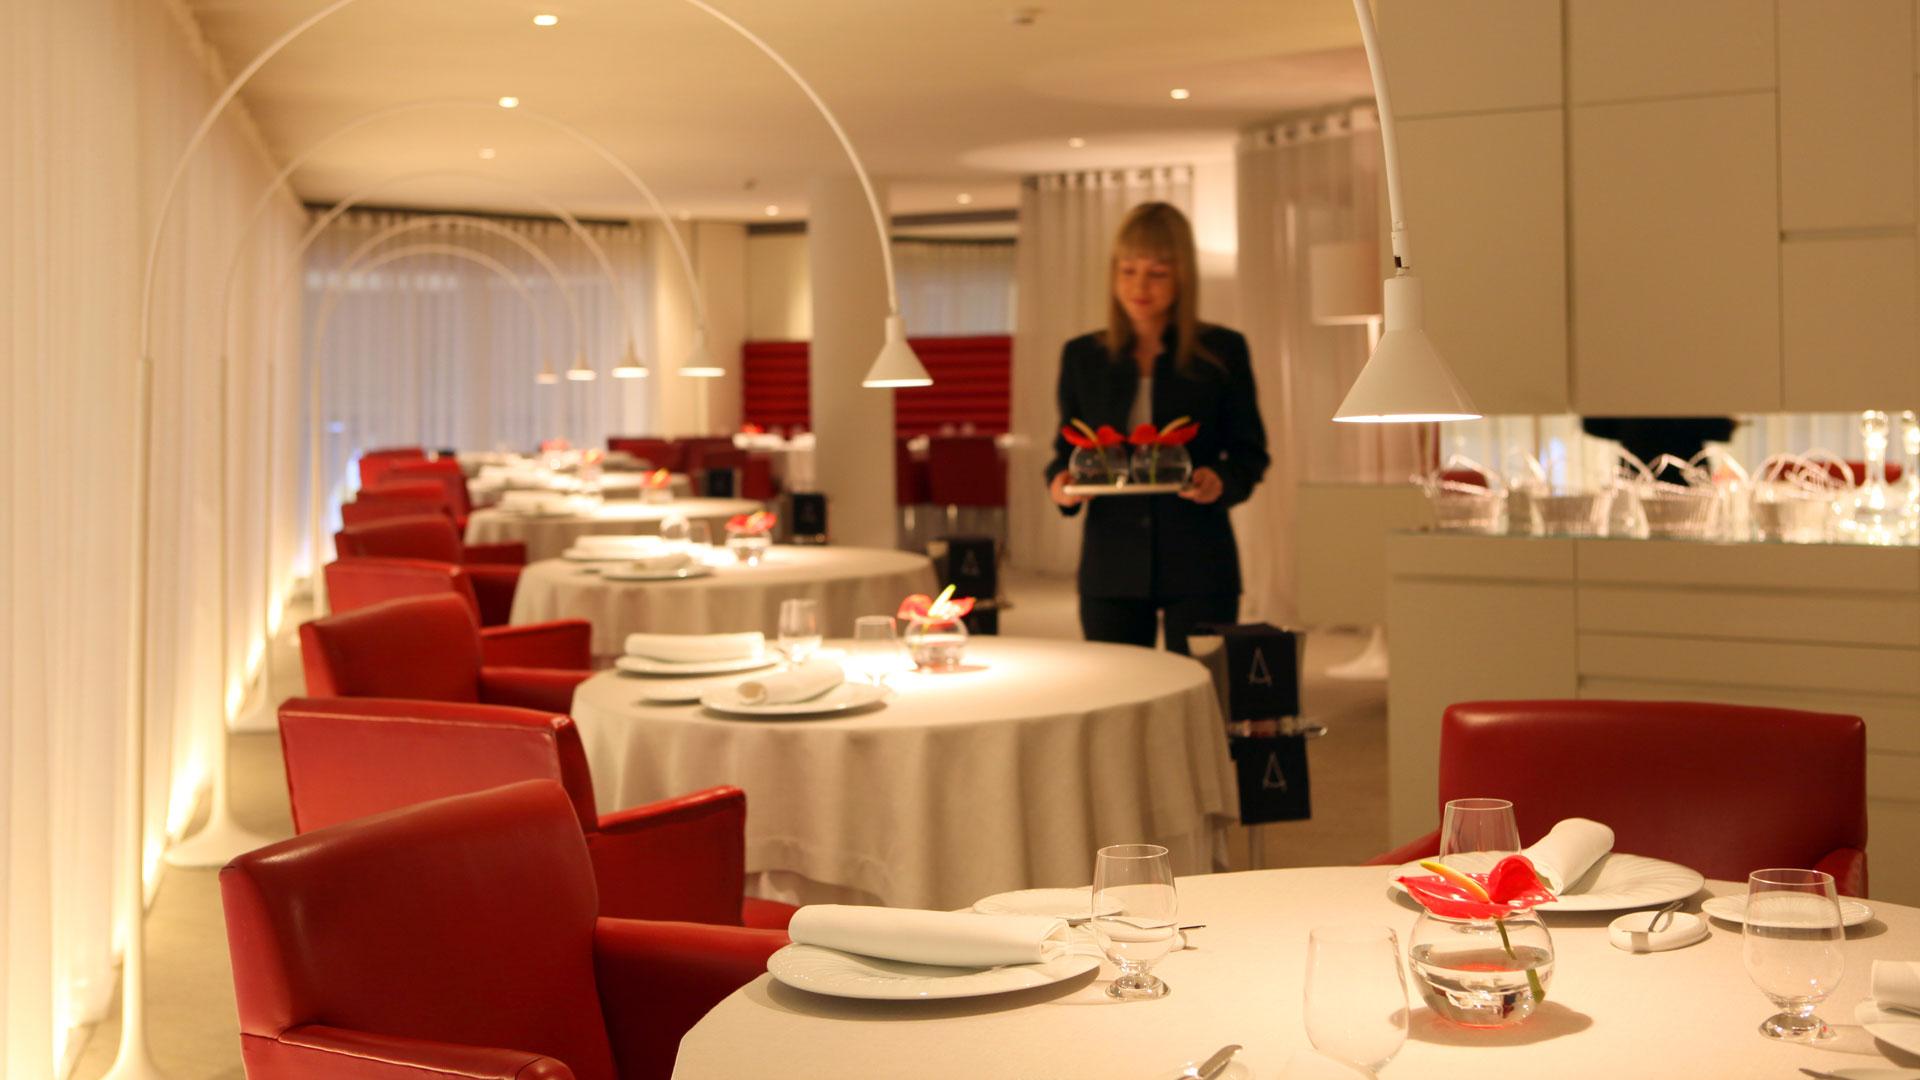 Michelin starred restaurants in barcelona restaurants for Hotel michelin